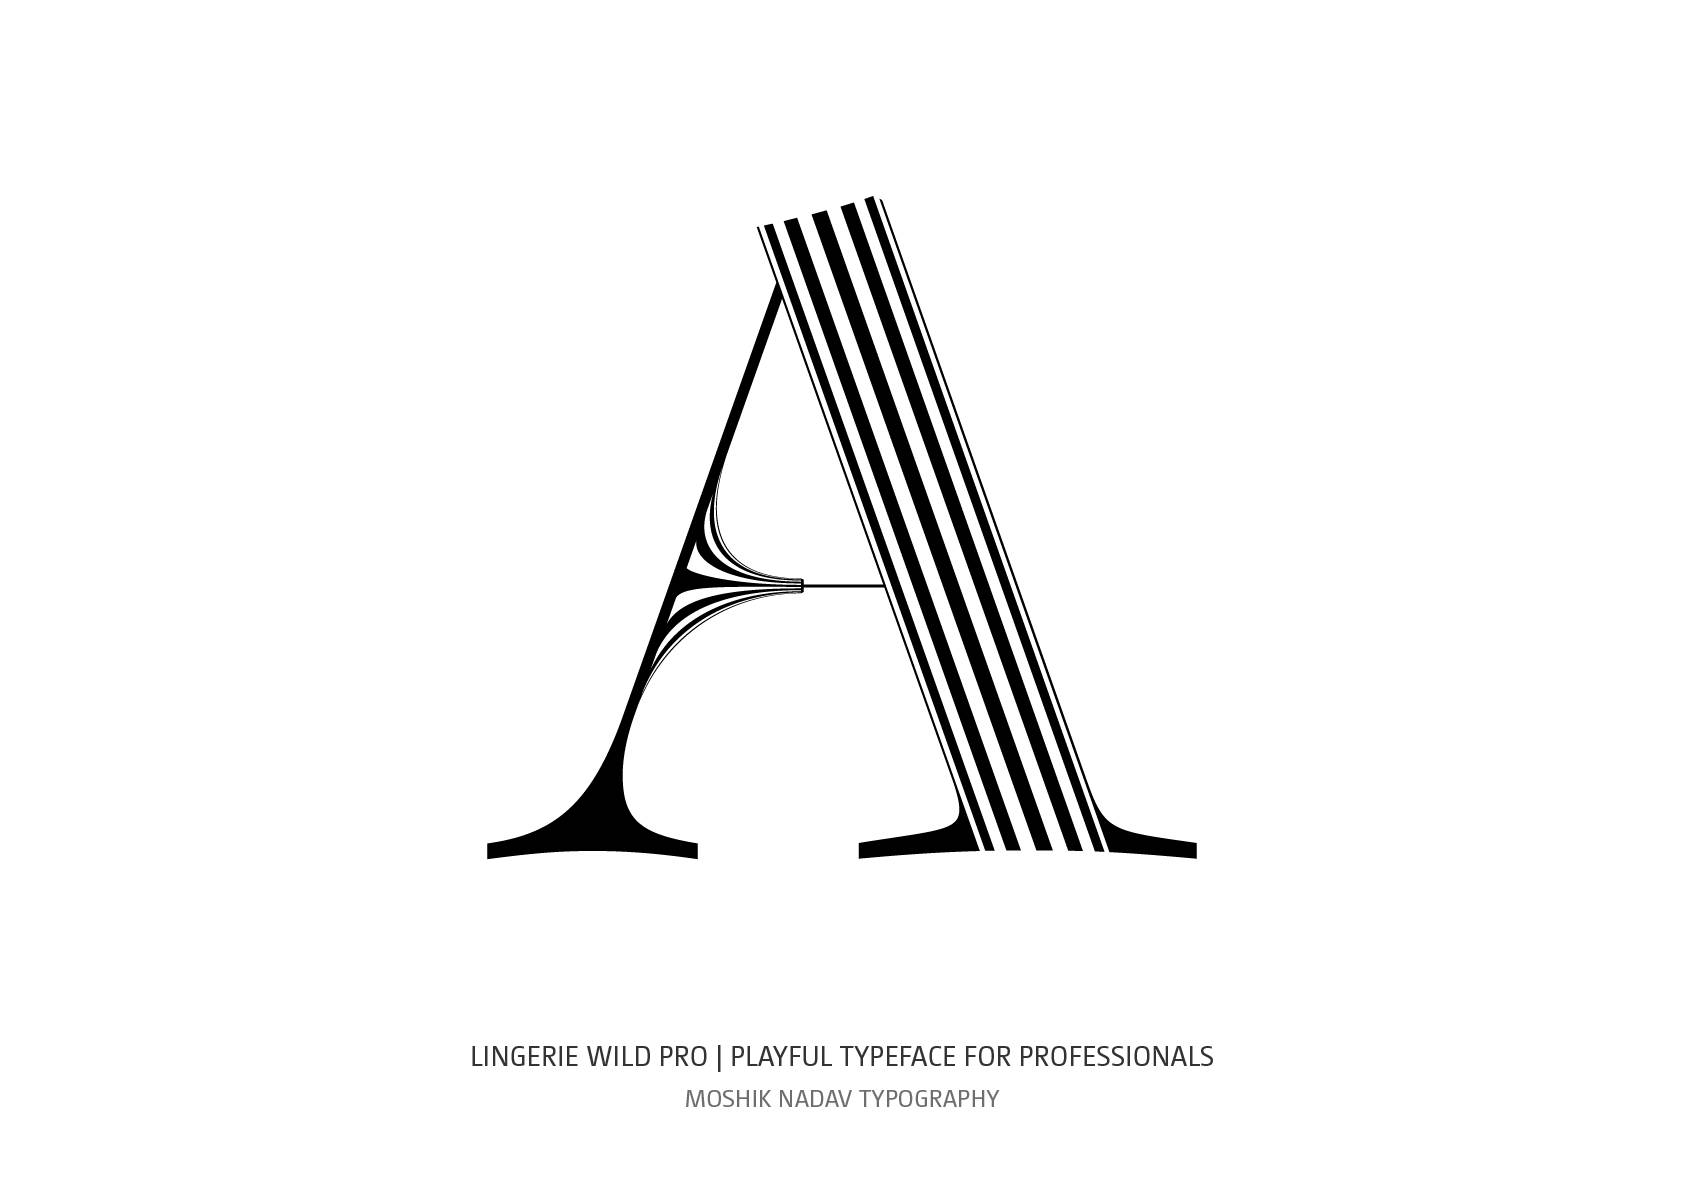 Lingerie Wild Pro uppercase A Typeface by Moshik Nadav Fashion Typography